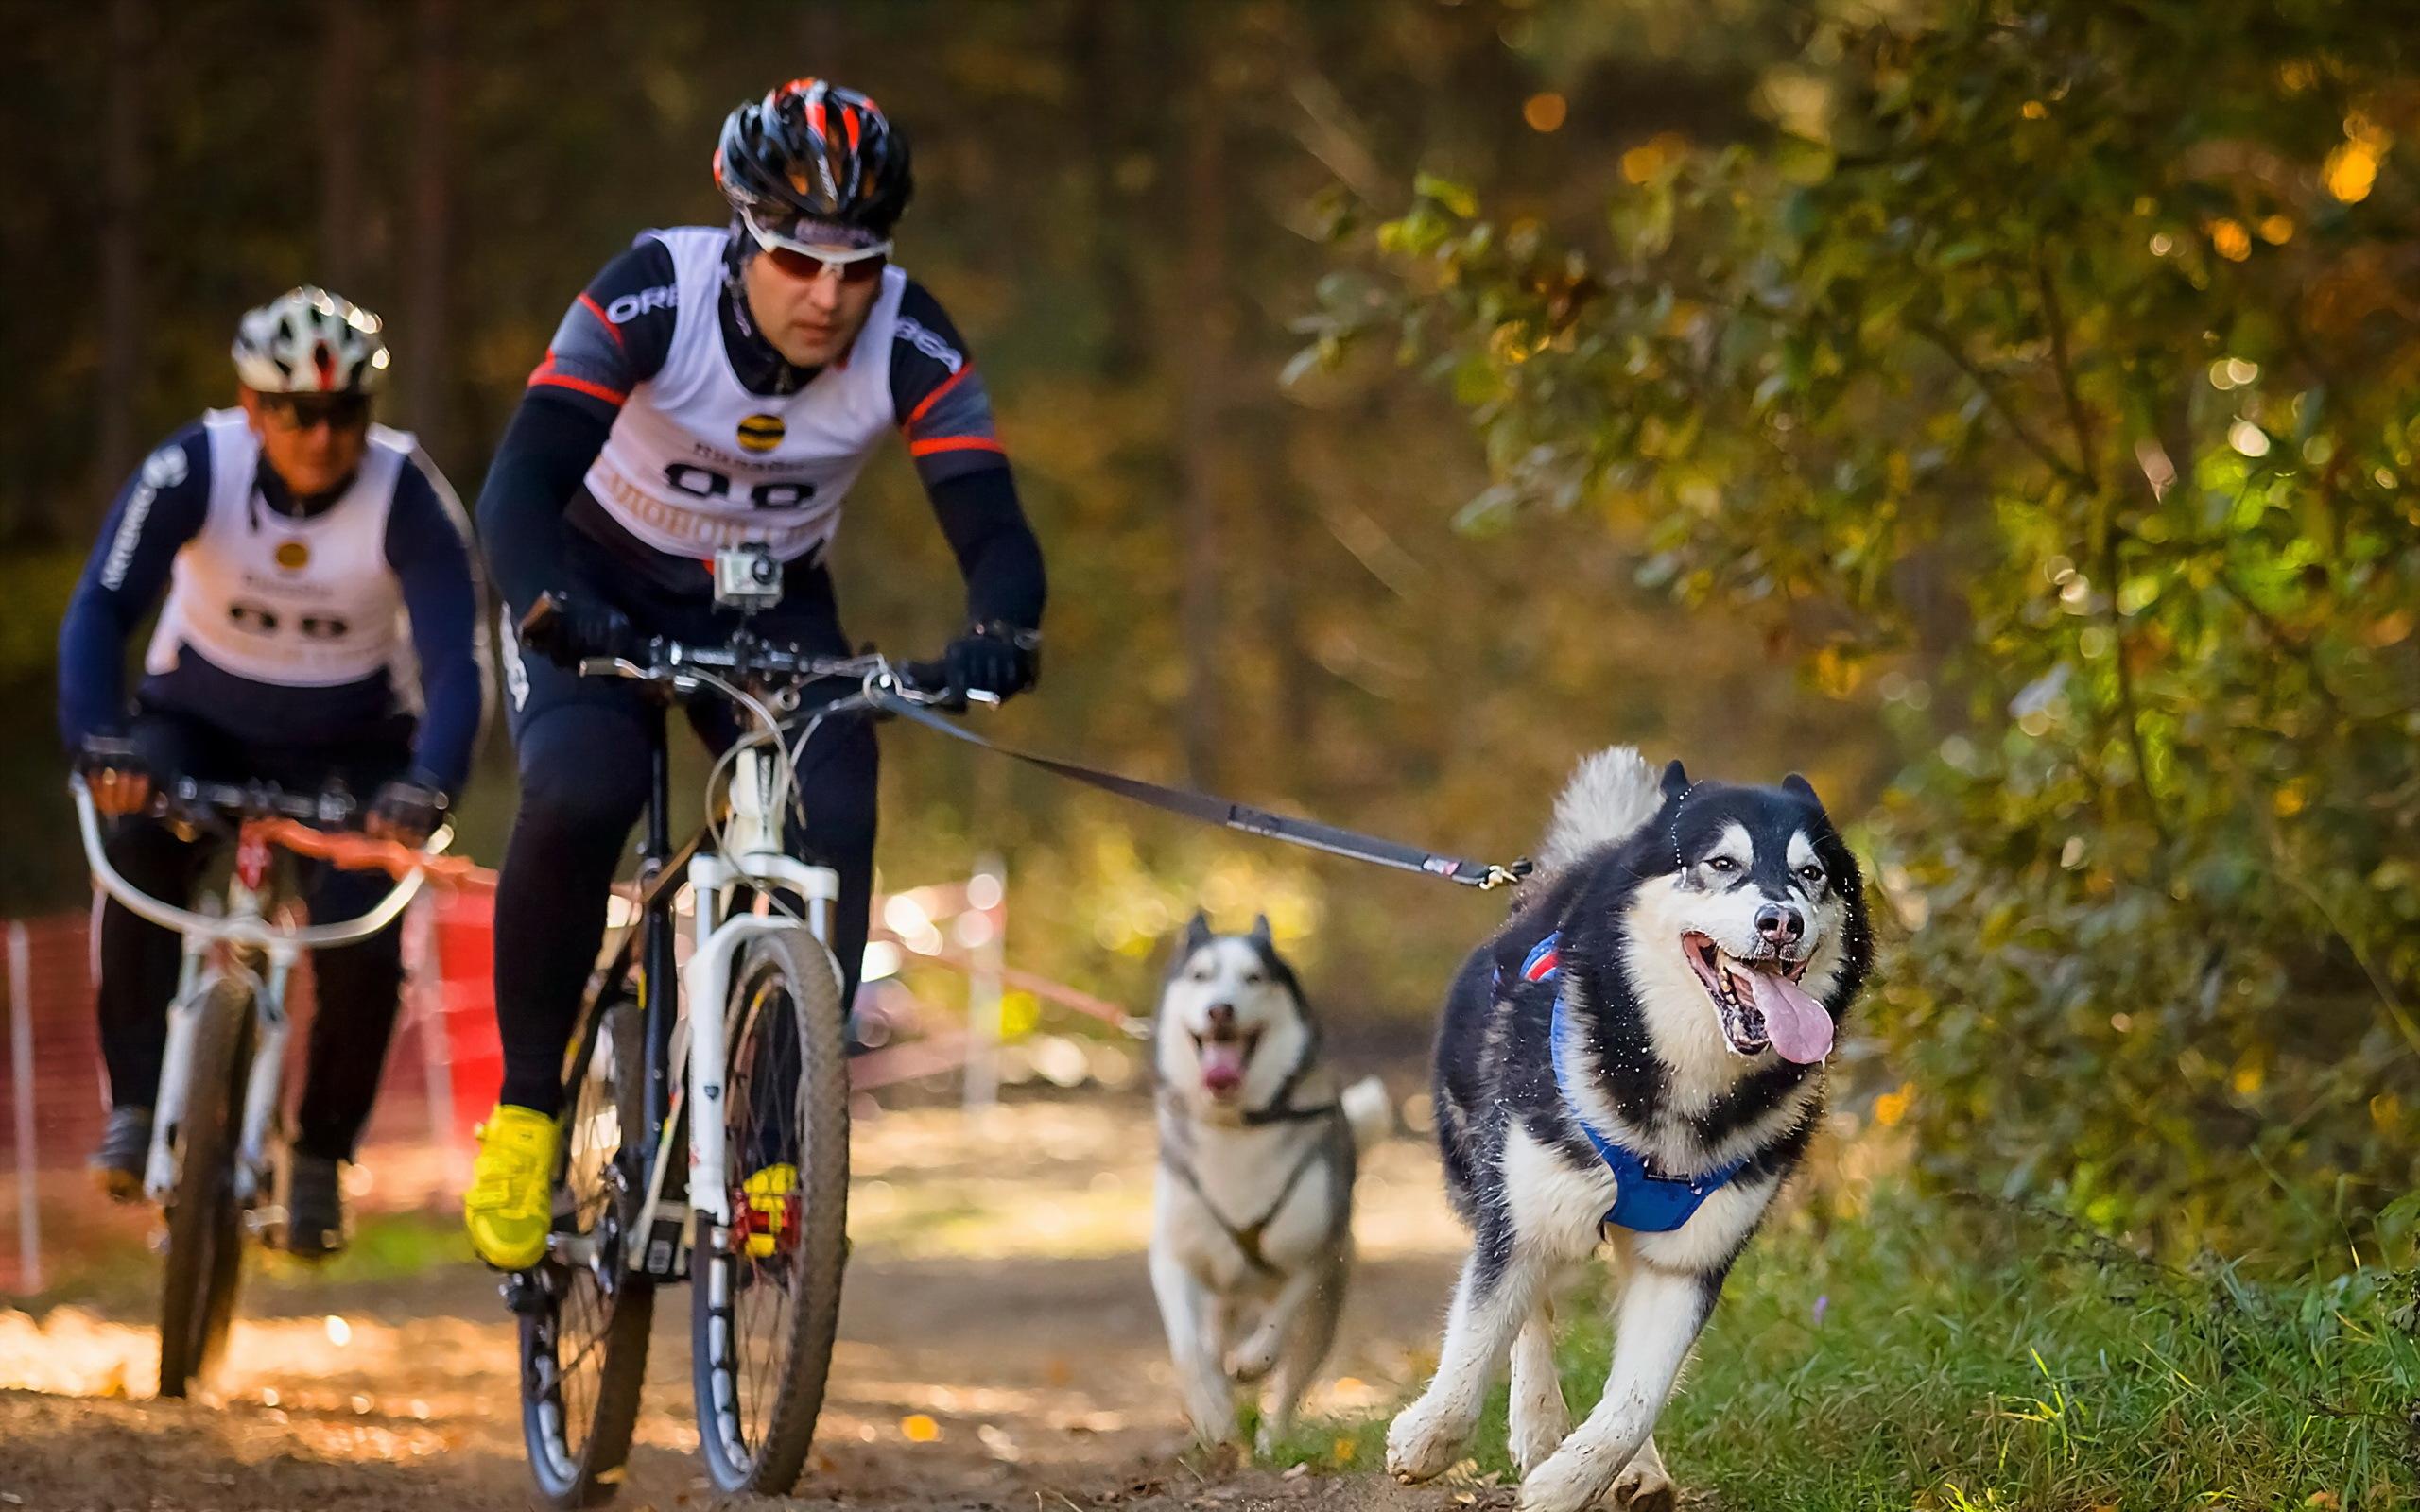 спорт велосипед споротсмен мужчина  № 1633607 загрузить